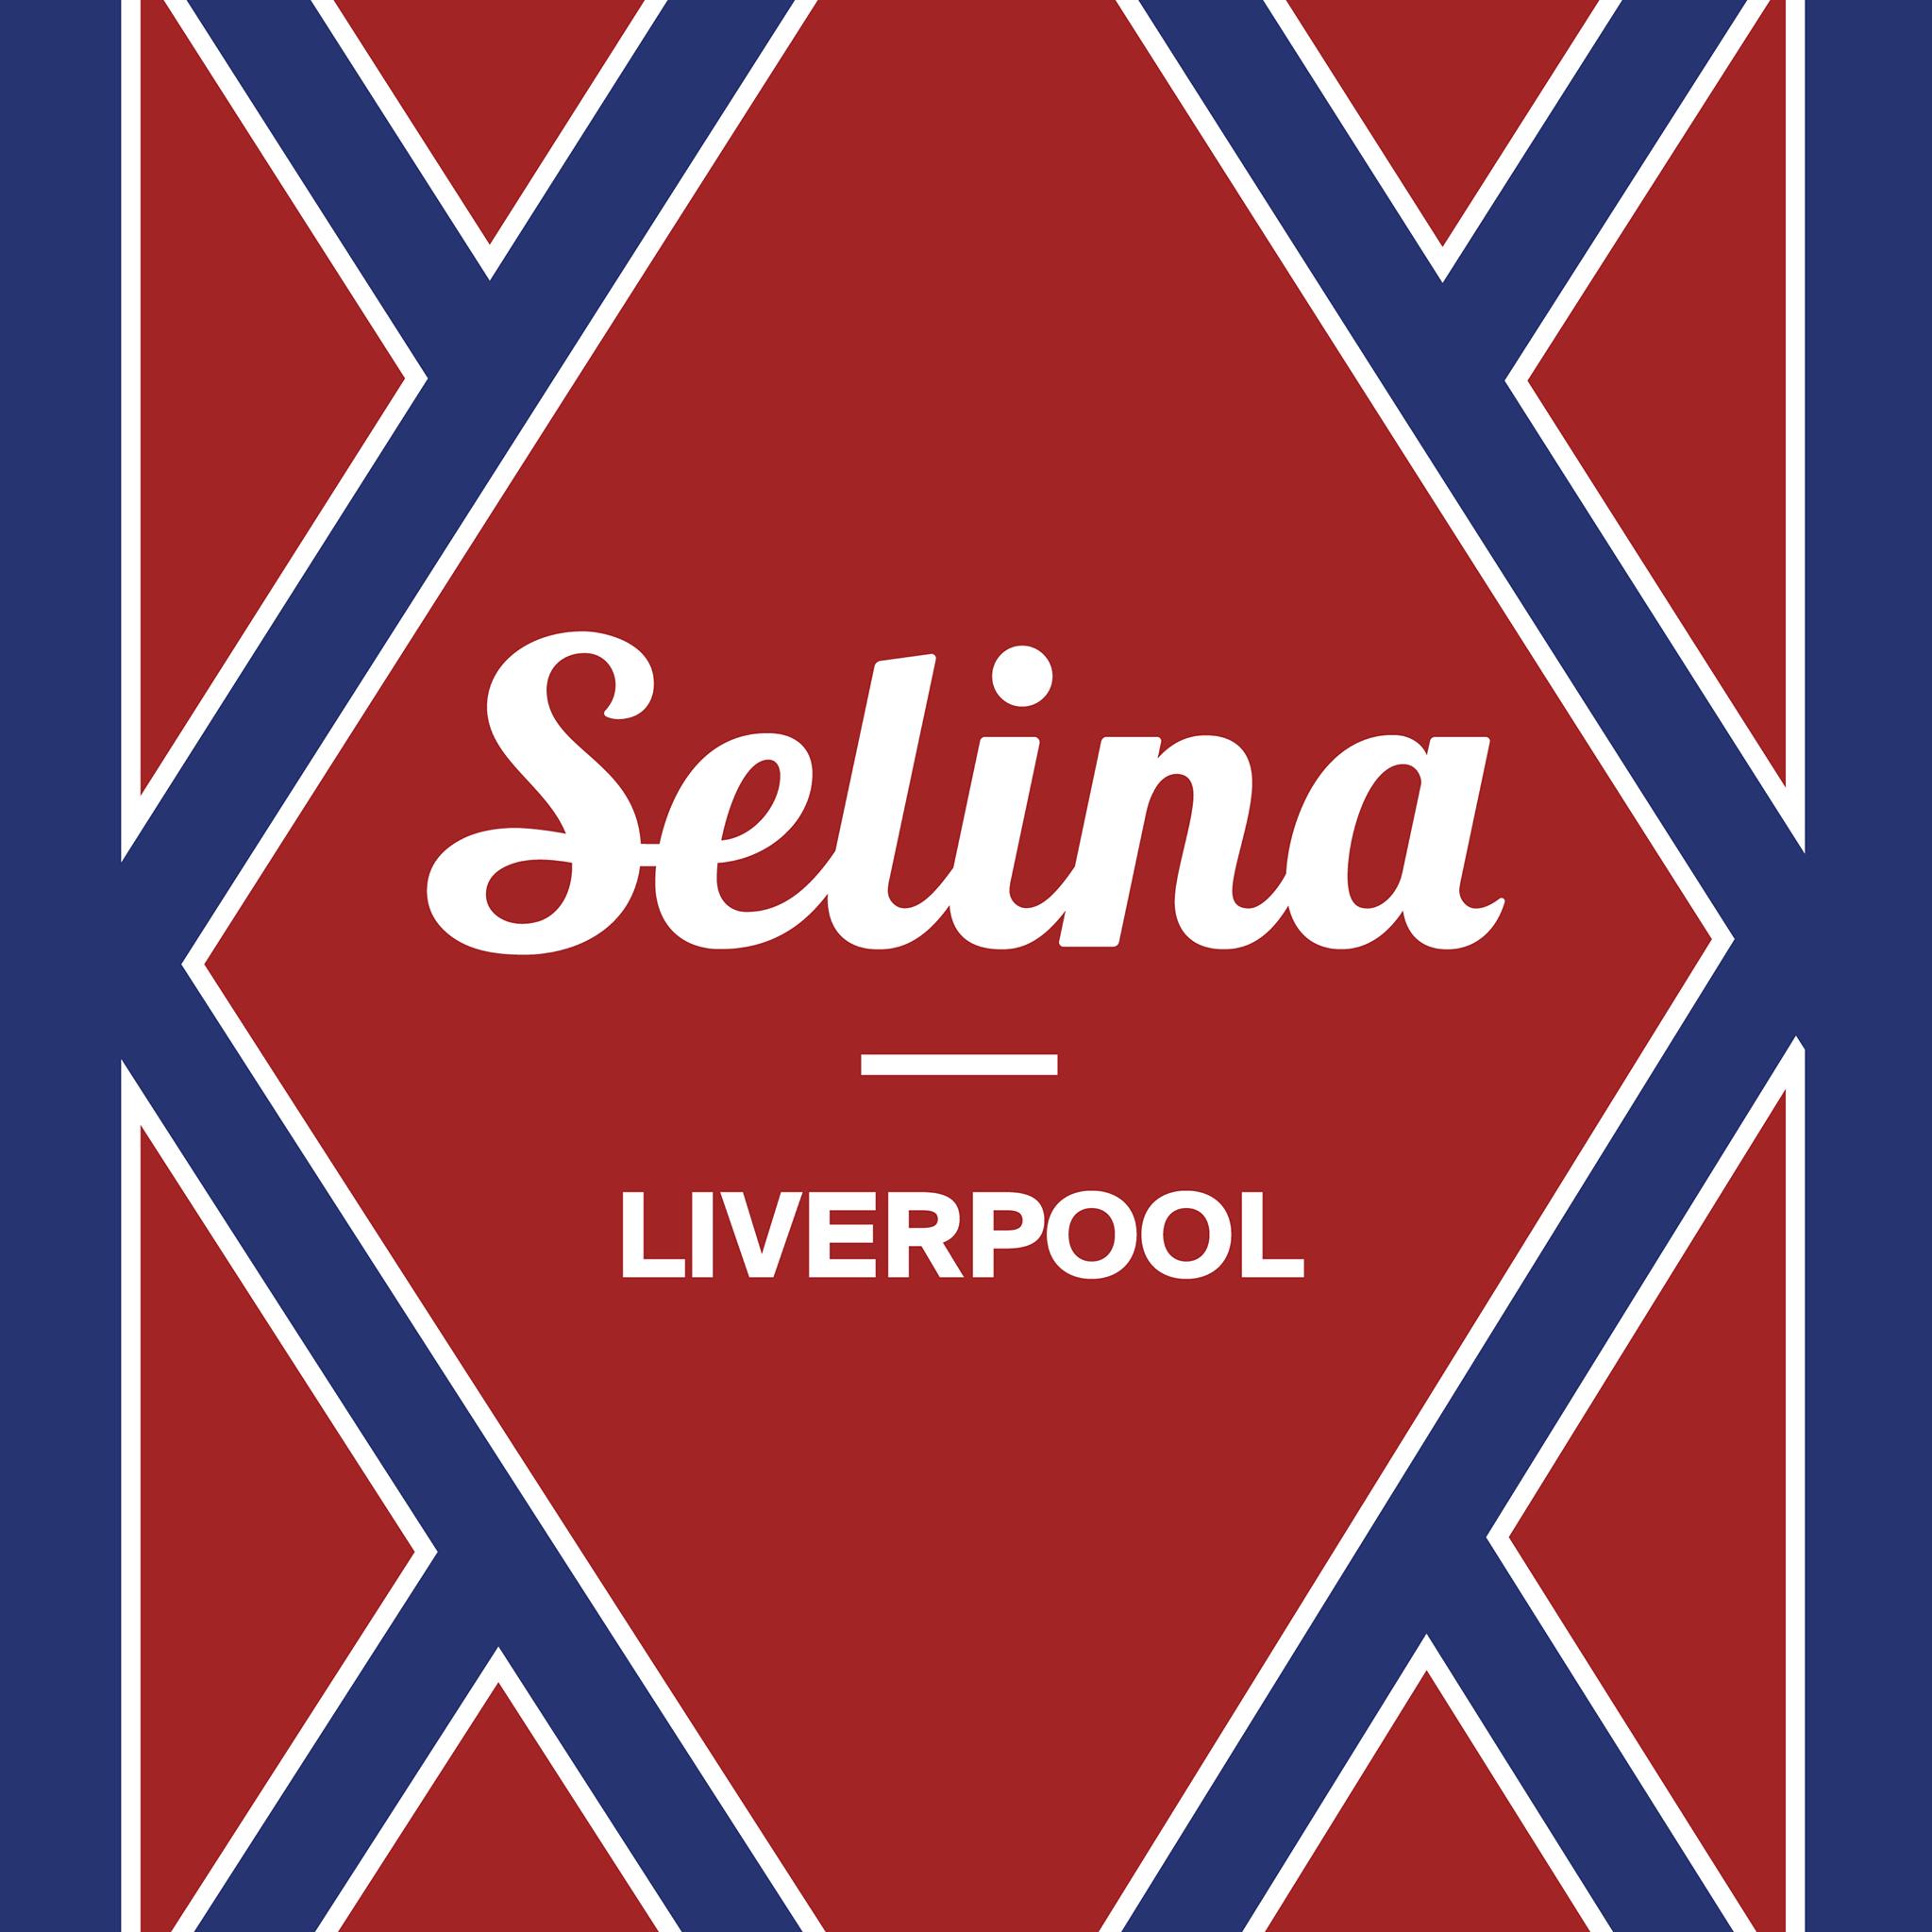 Selina Liverpool Coliving Company